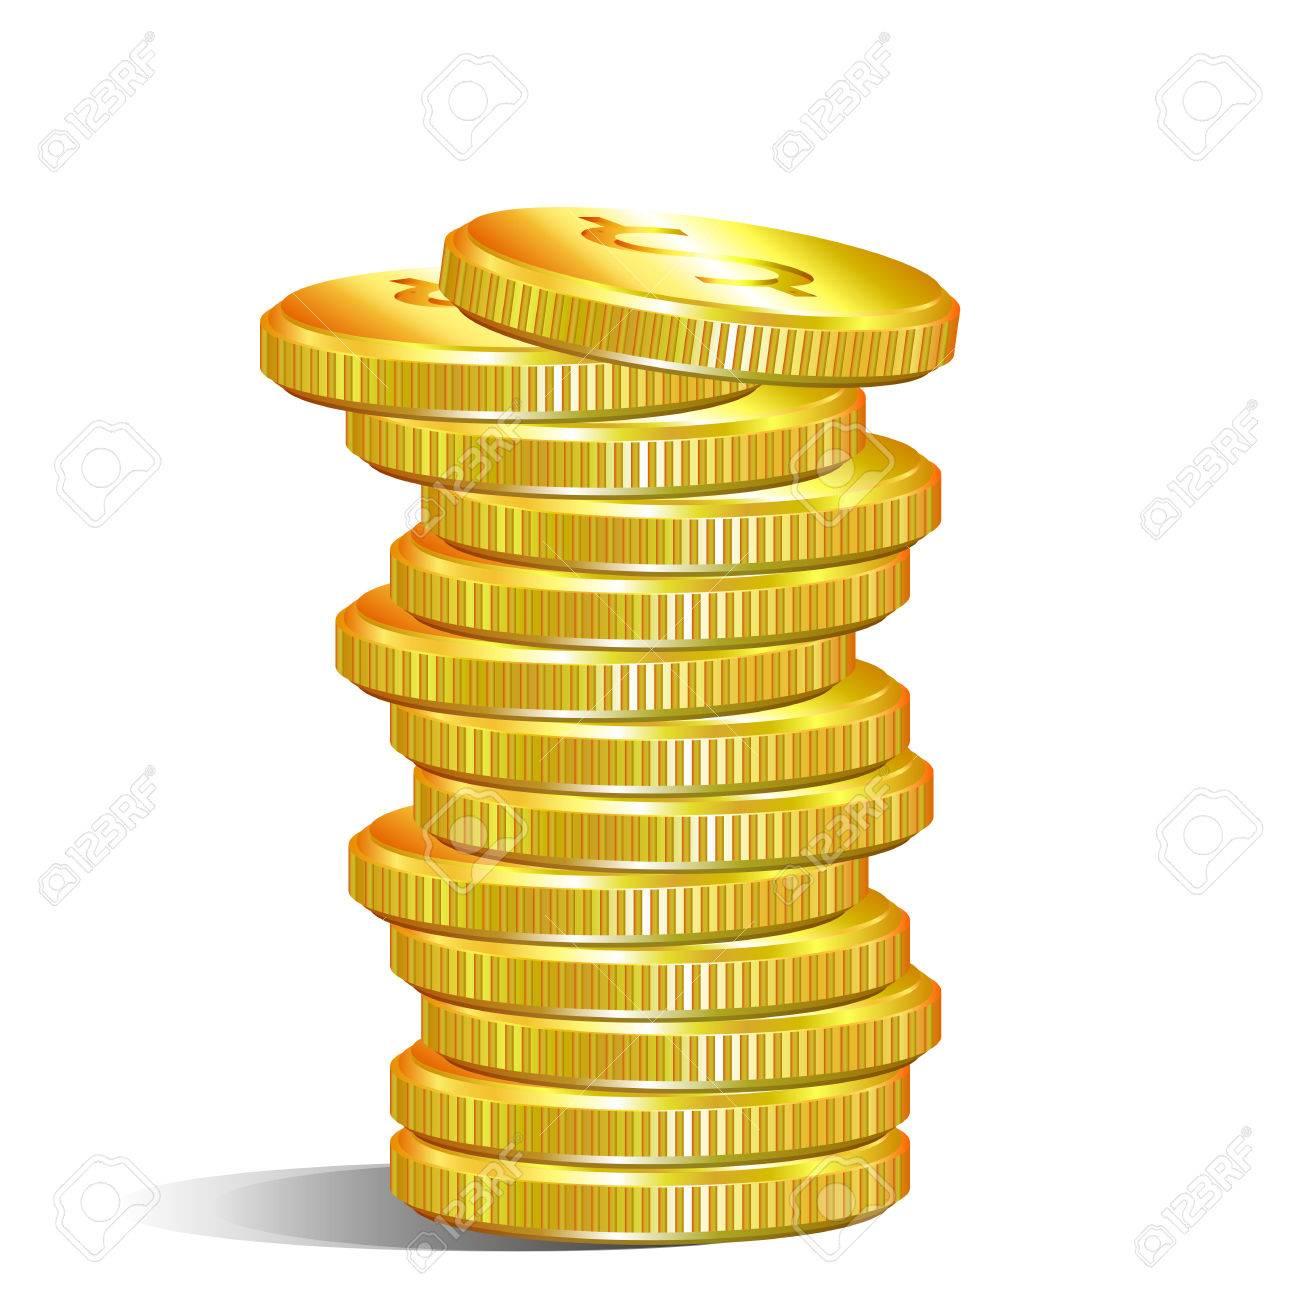 a pile of gold dollar coins vector art illustration money royalty